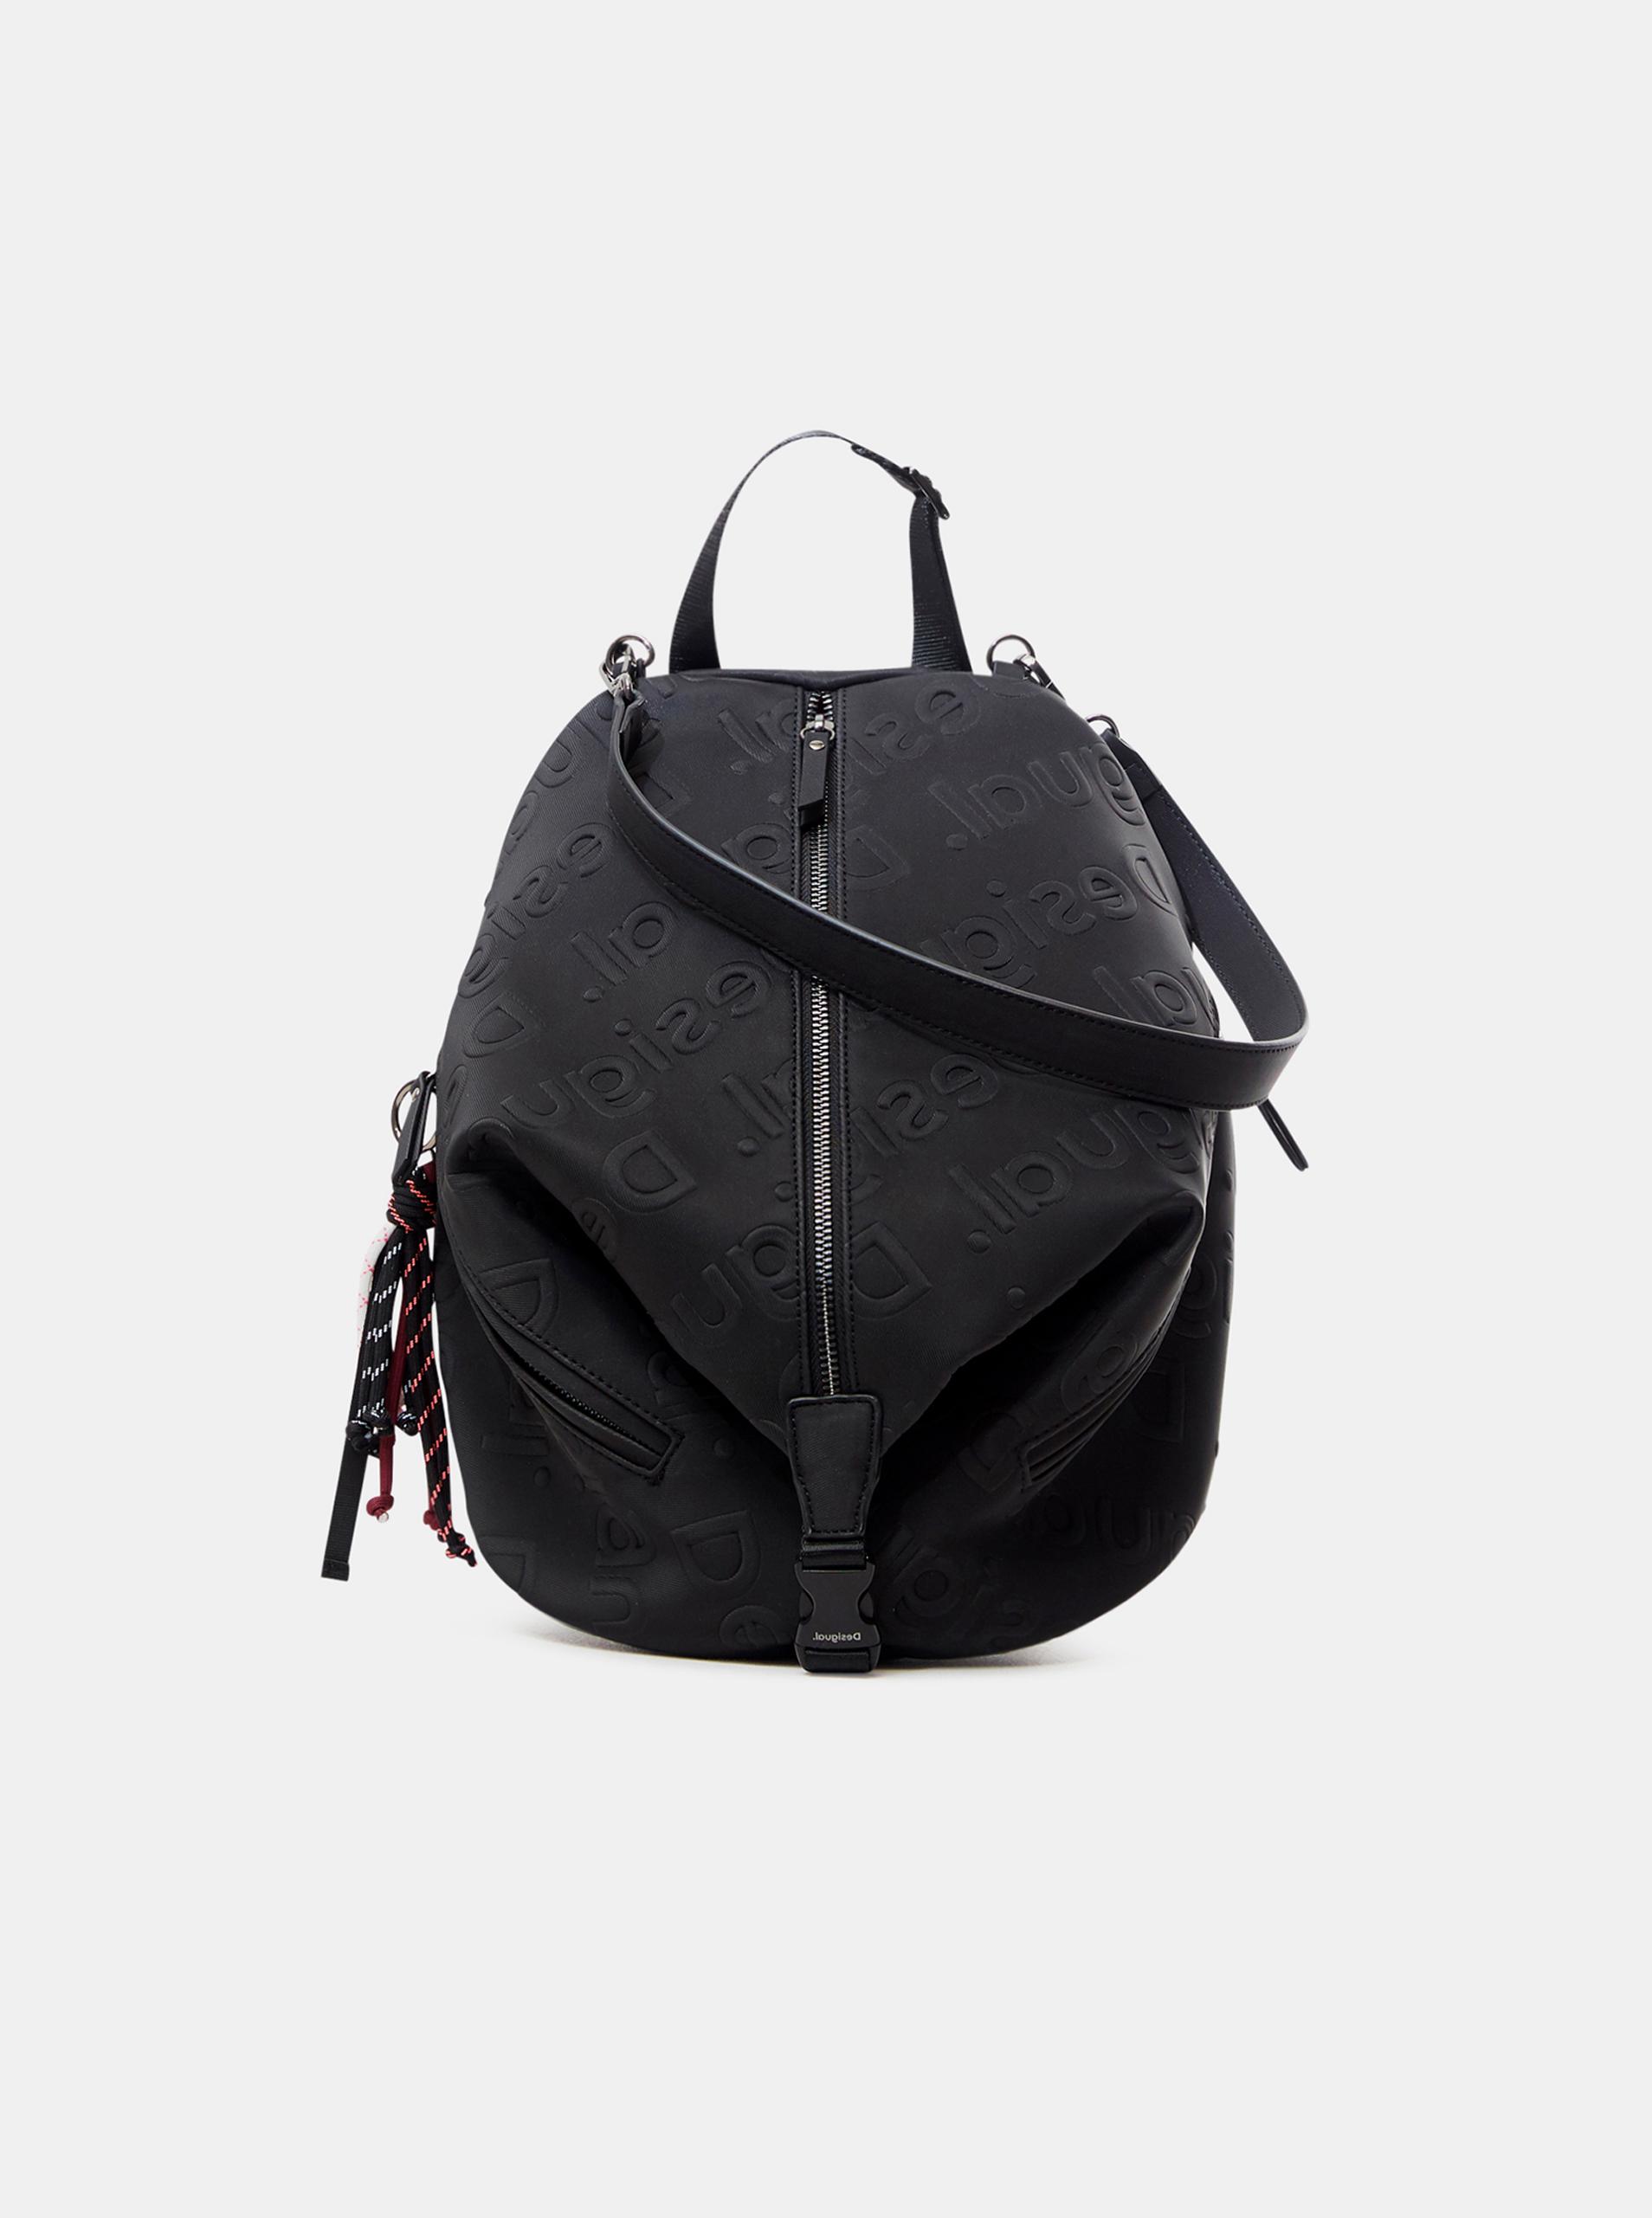 Desigual Women's backpack black  Galia